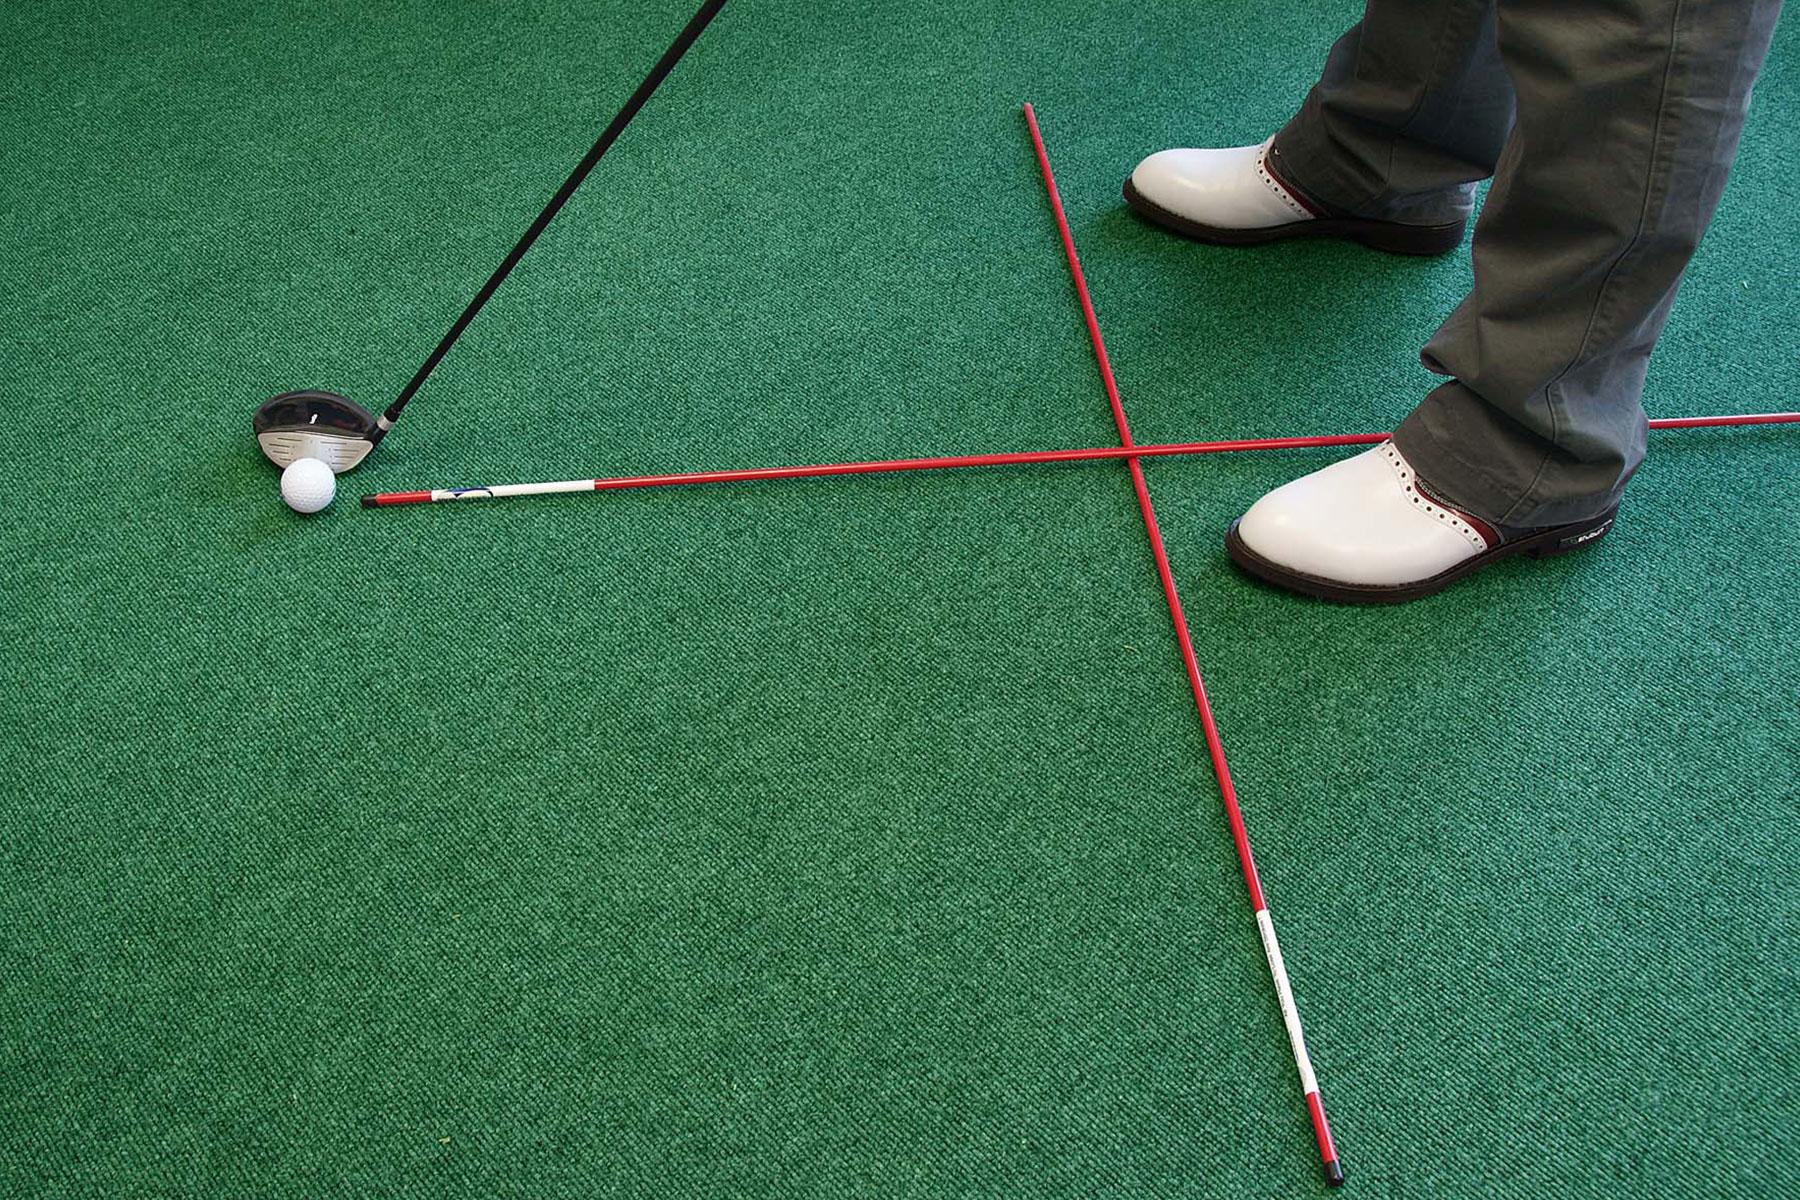 Pga Tour Pro Sticks Training Aid From American Golf